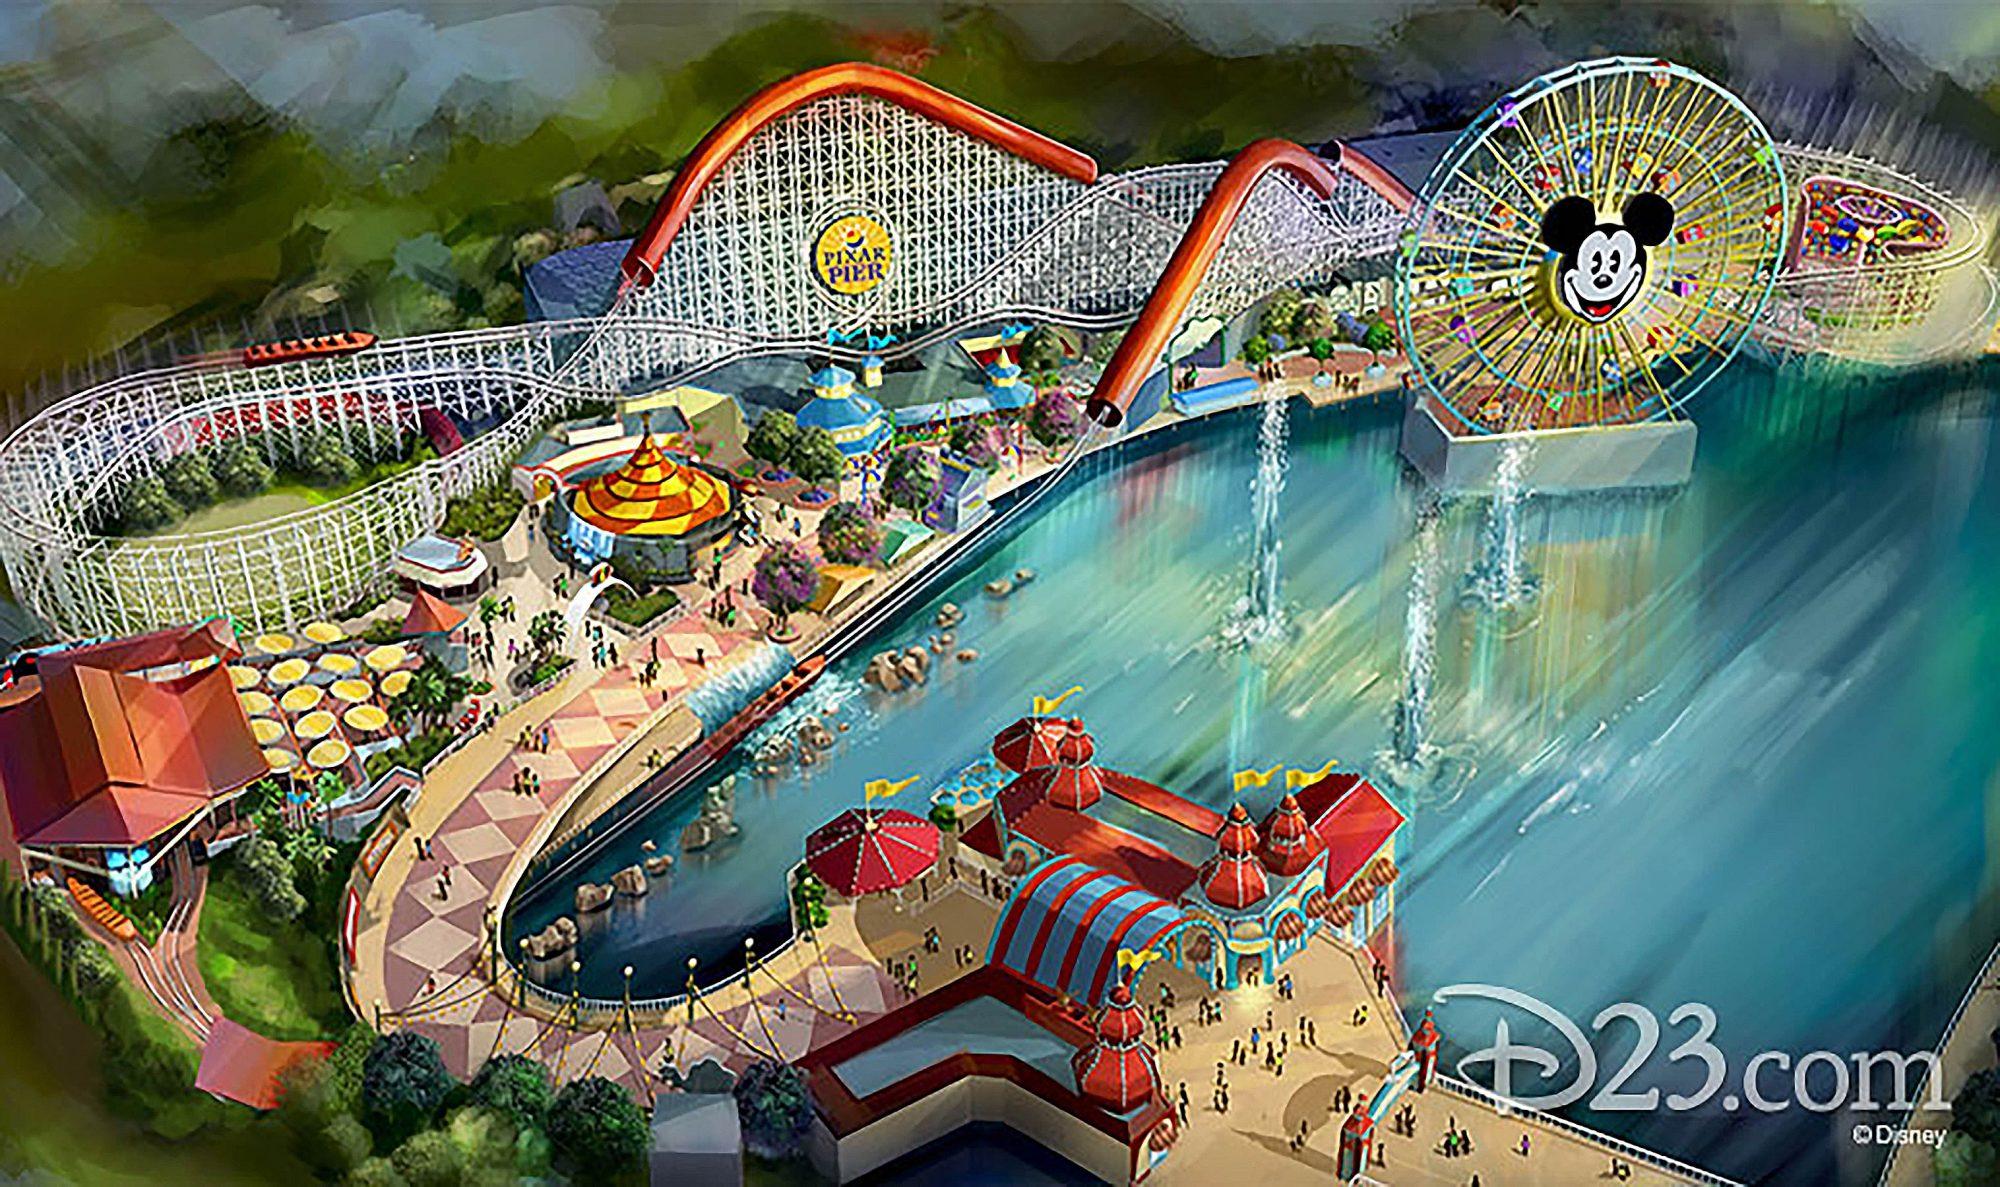 Disney's Pixar Pier